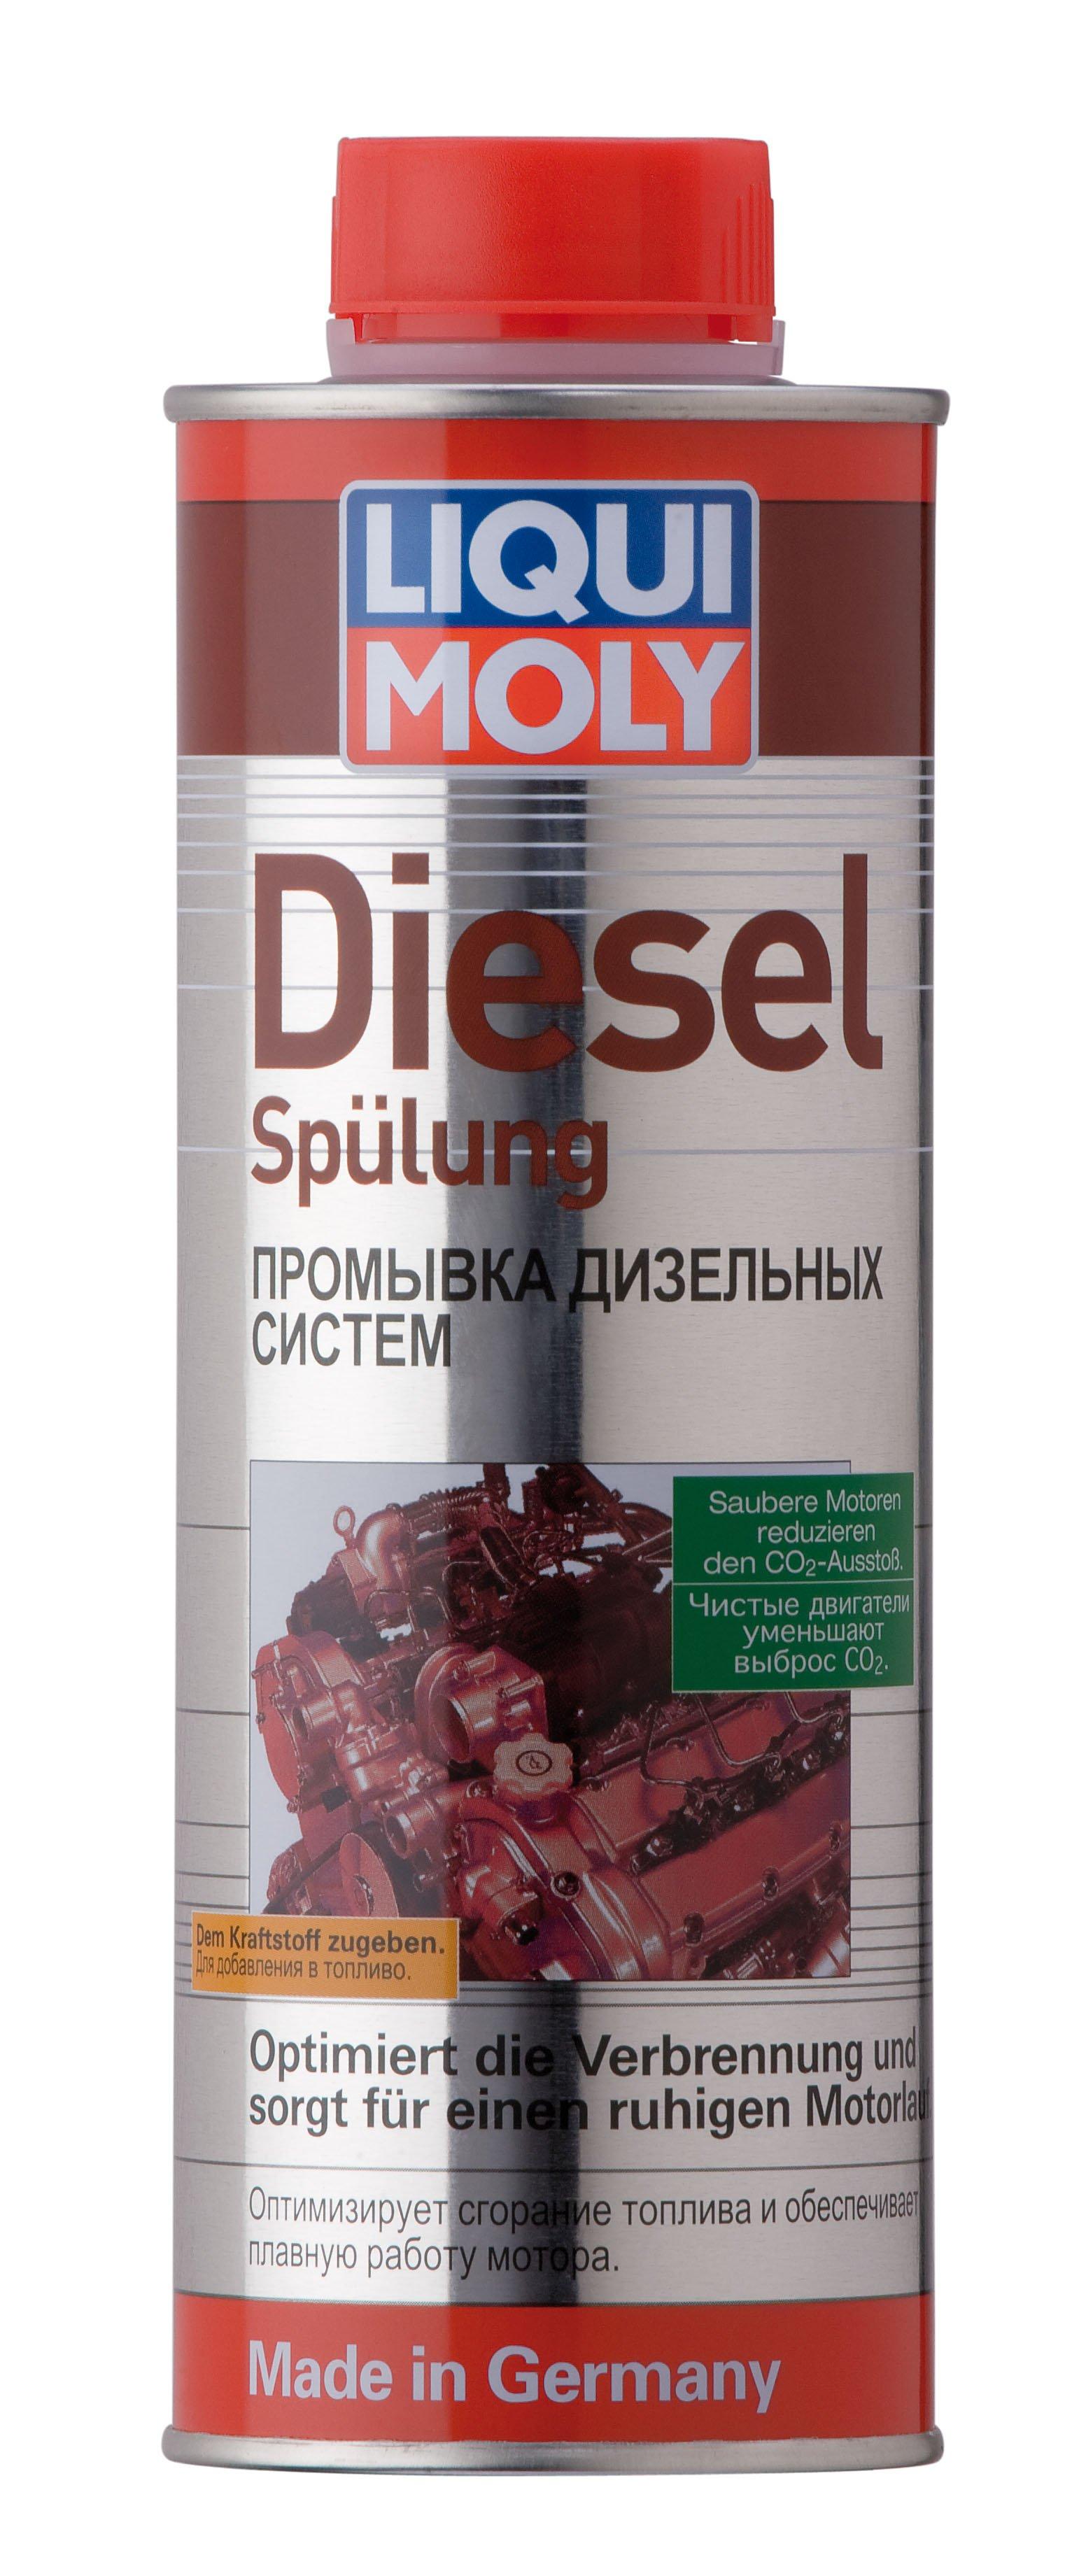 Liqui Moly Diesel-Spulung 500 мл